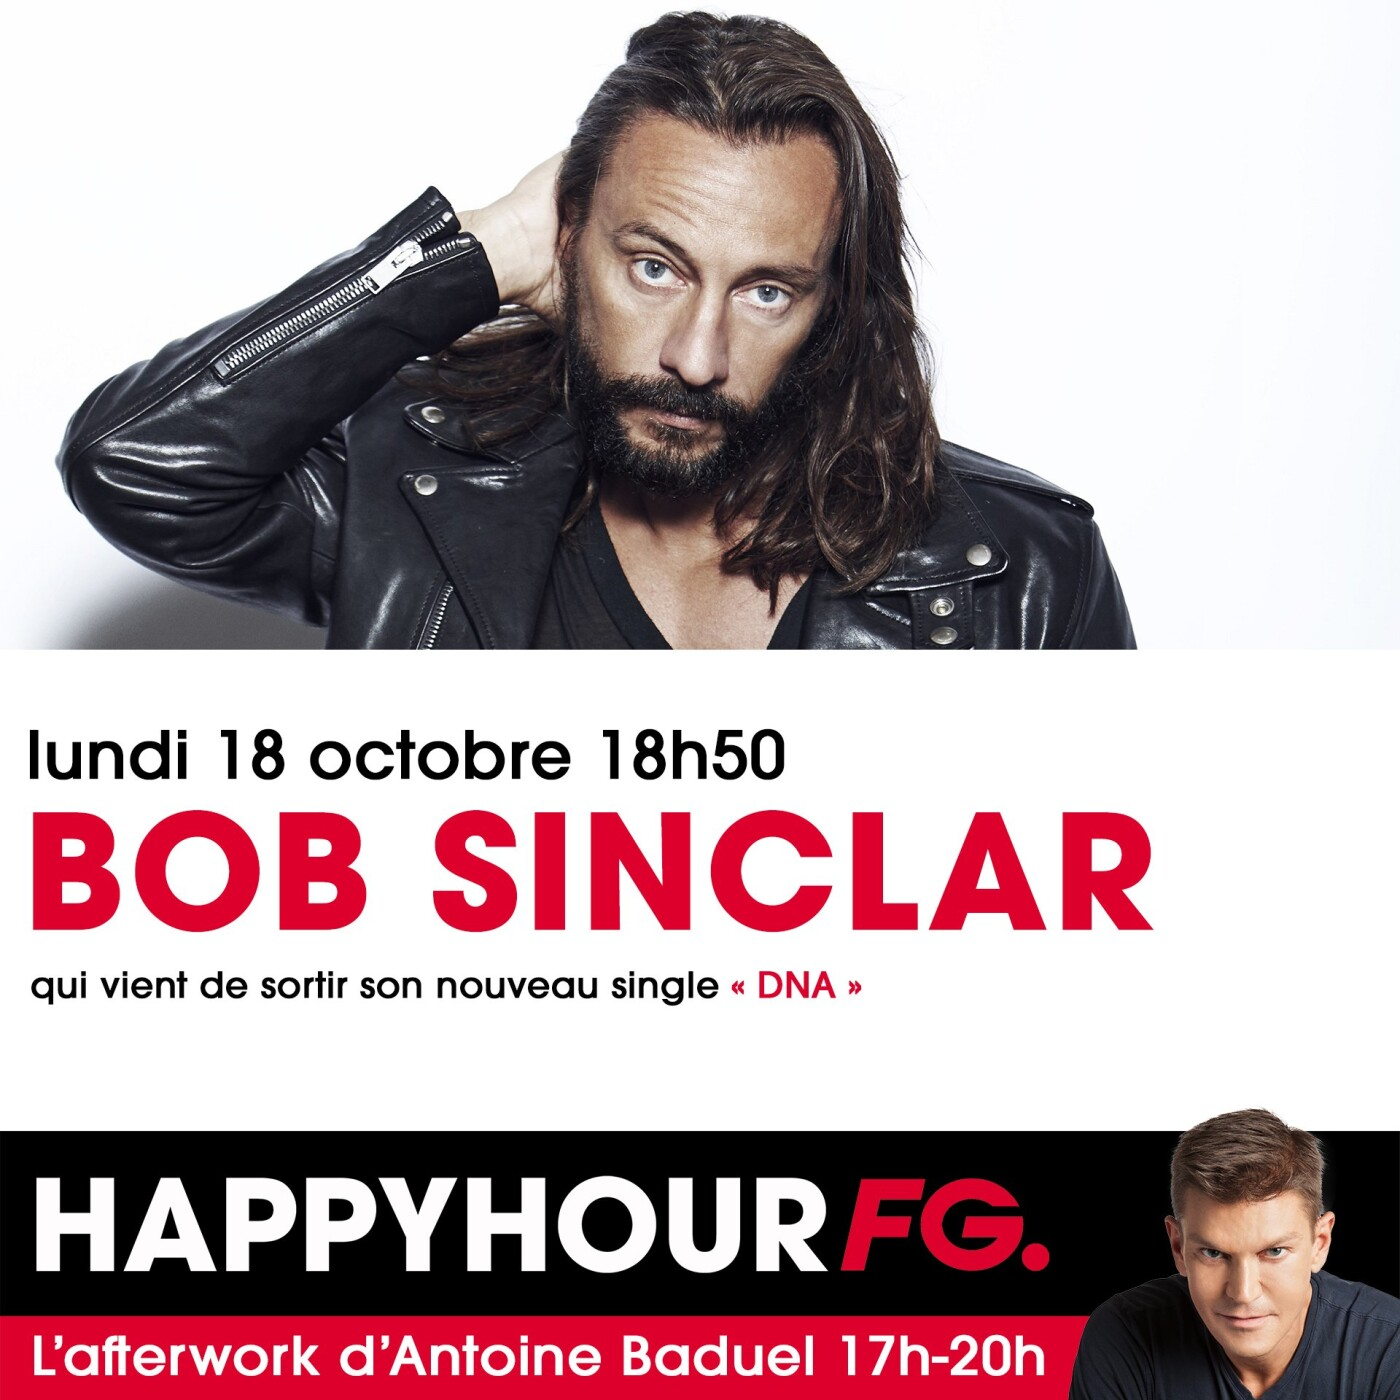 HAPPY HOUR INTERVIEW : BOB SINCLAR